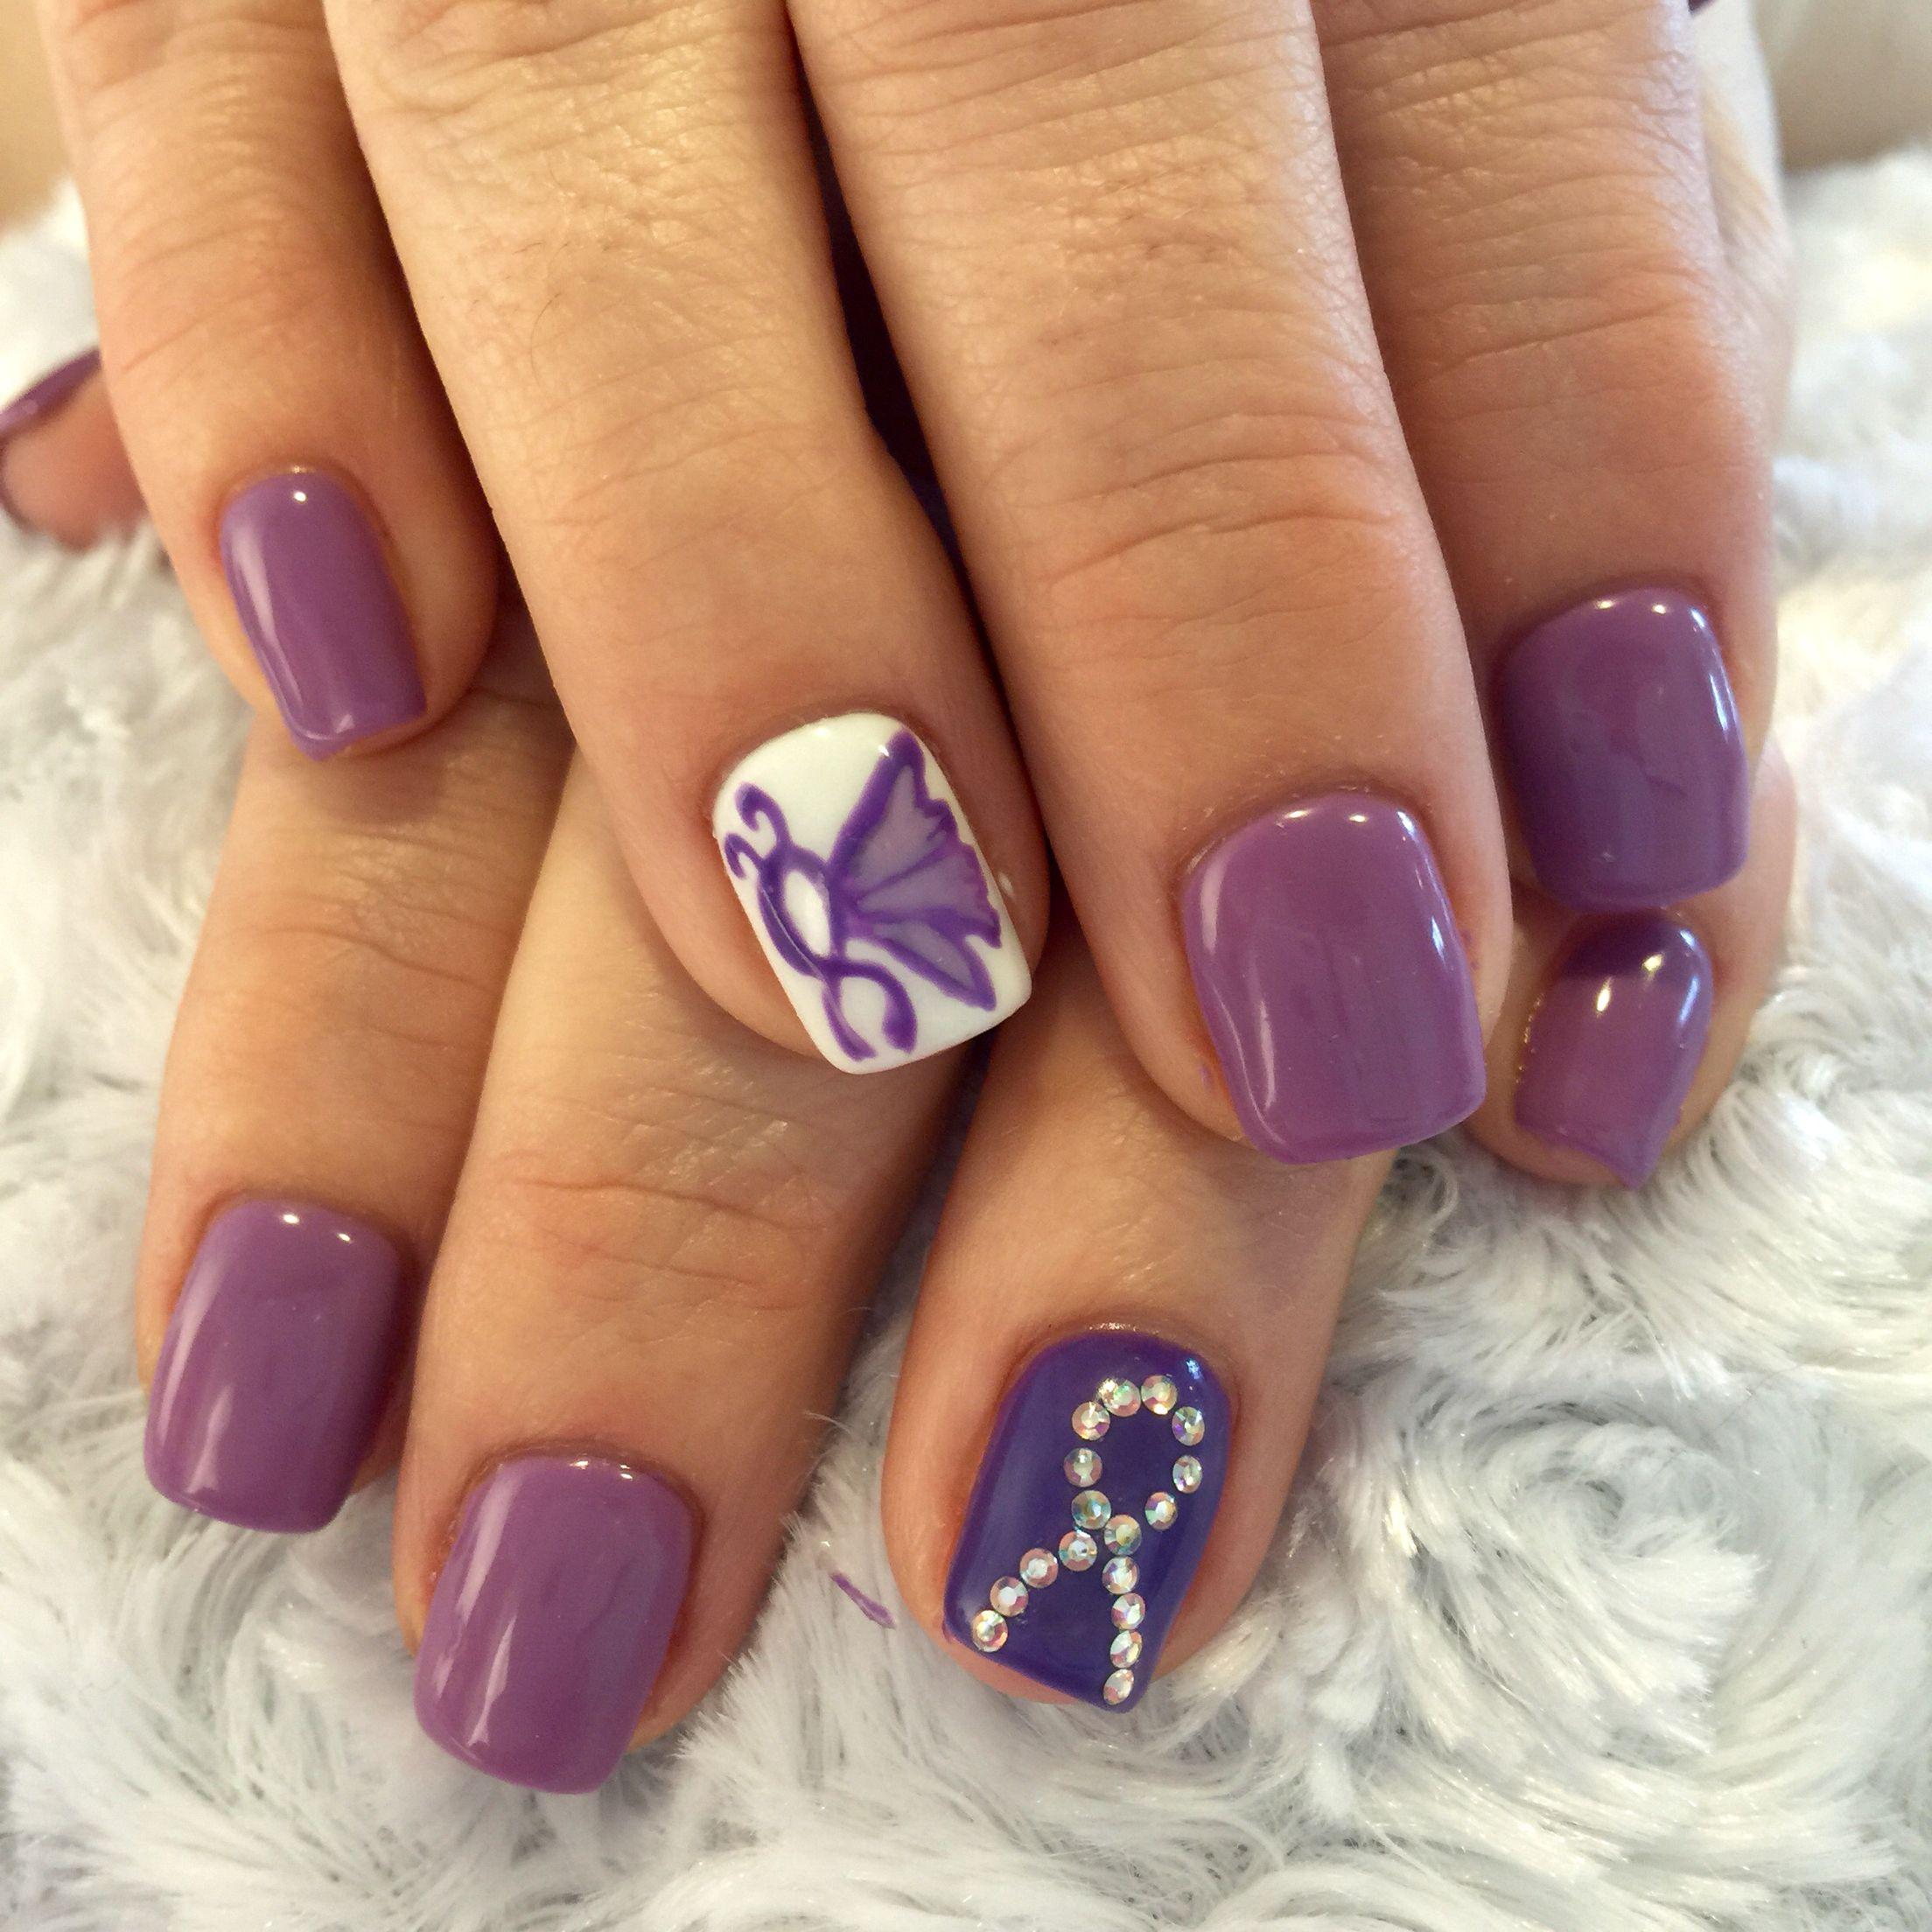 Epilepsy Awareness Nails Fancy Nails Pastel Nails Designs Nails By Lisa